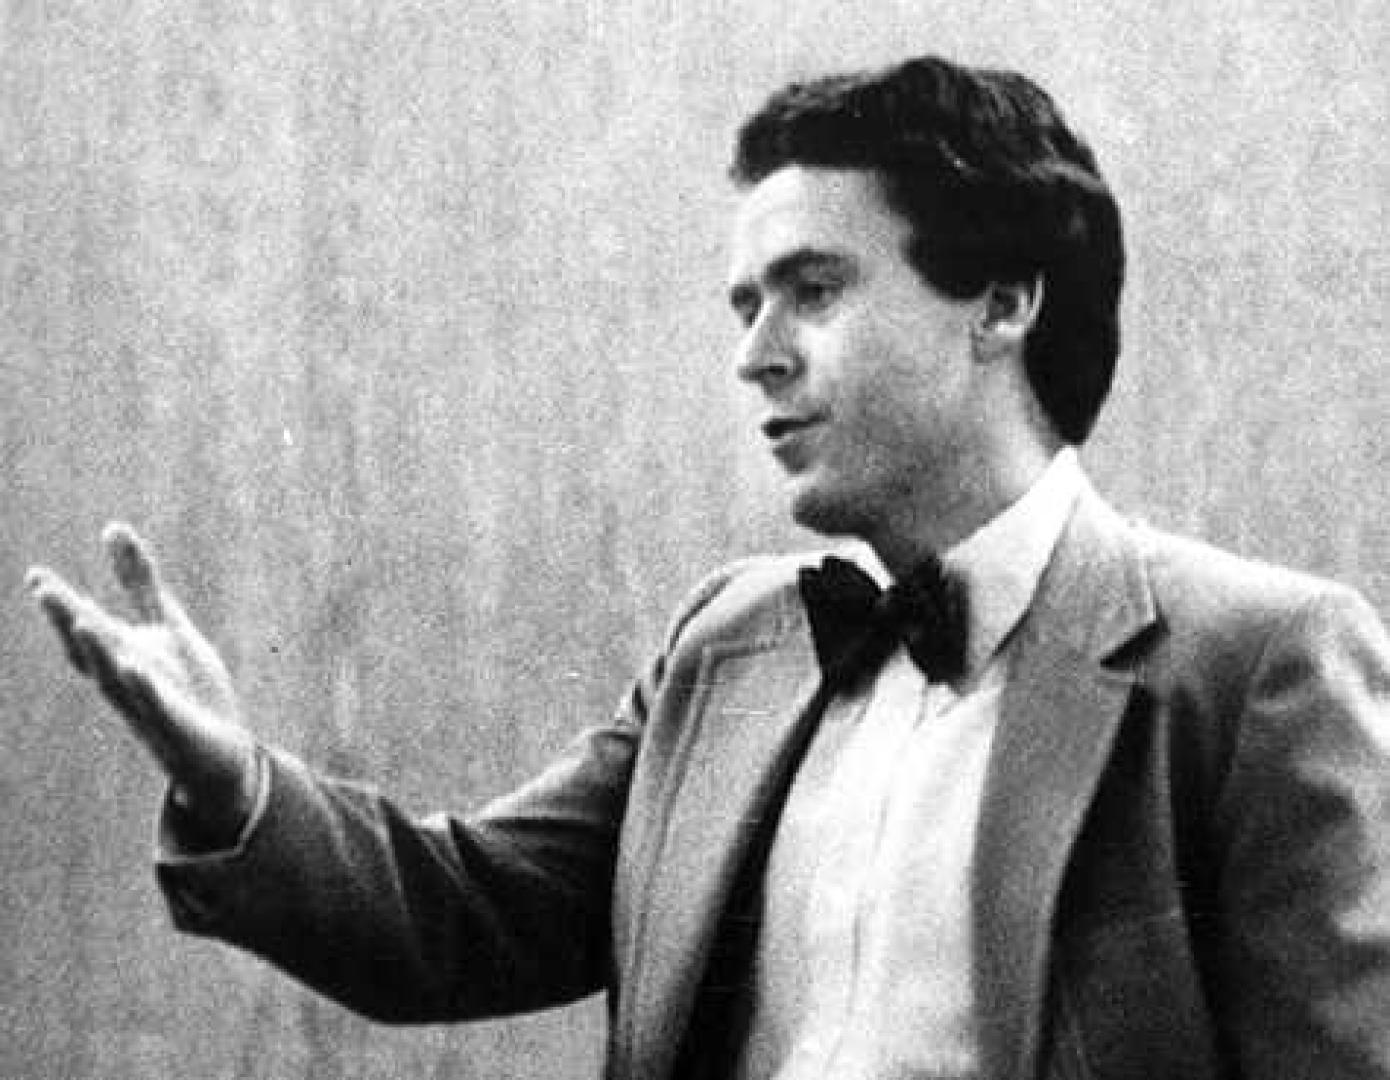 Ted Bundy 21. kép